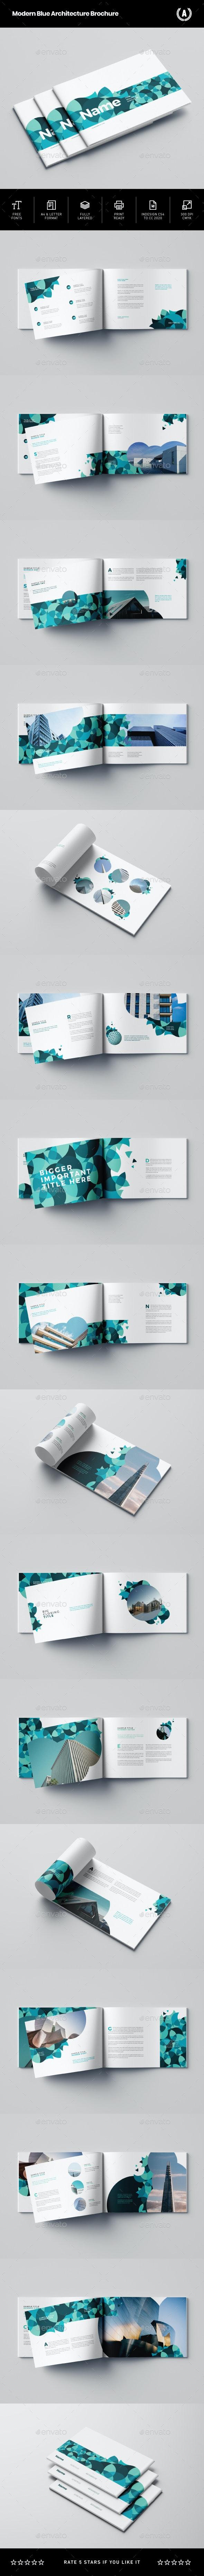 Modern Blue Architecture Brochure - Brochures Print Templates